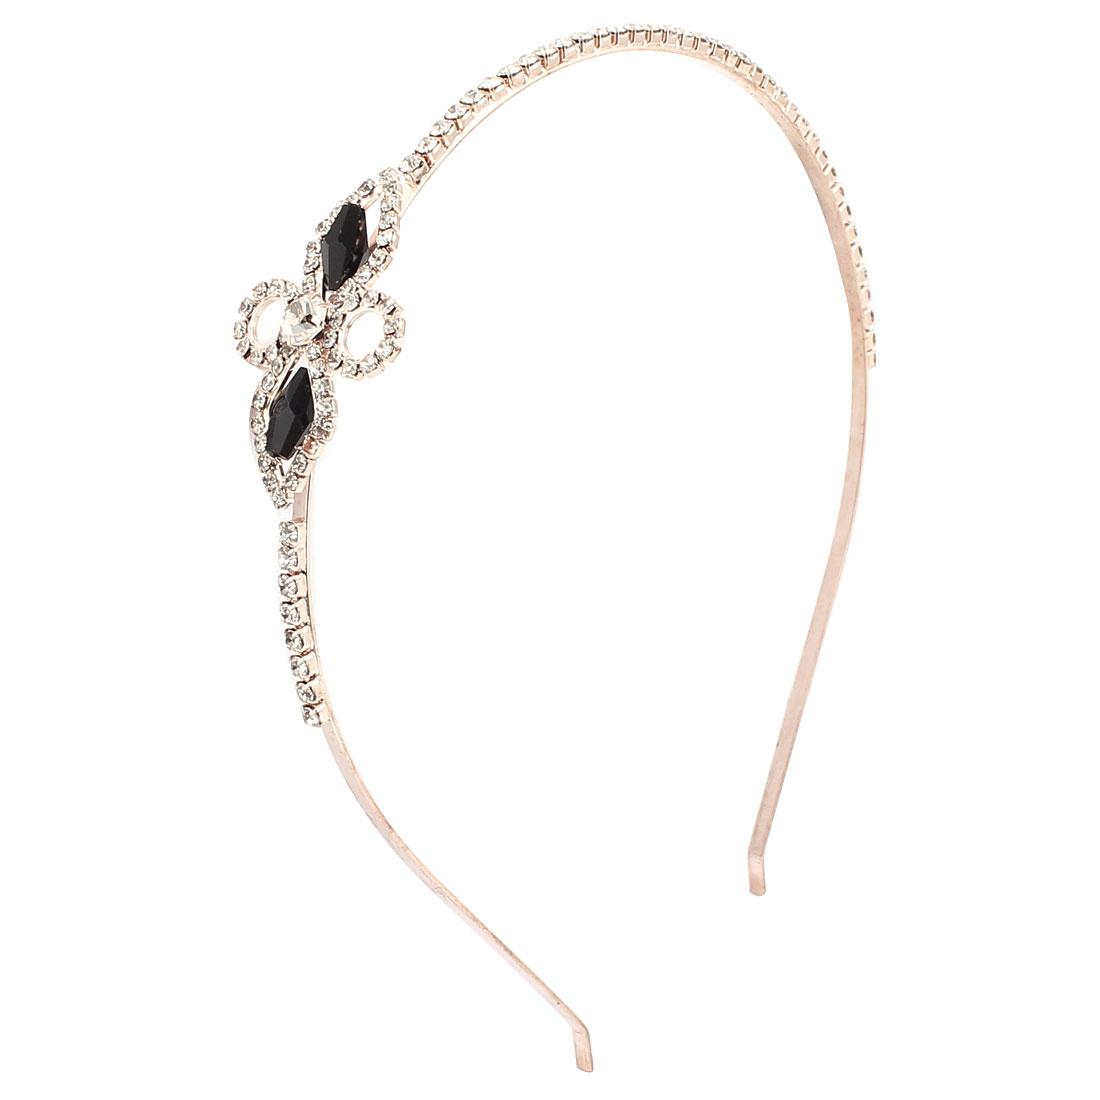 Woman Hairstyle Bowknot Detail Rhinestones Inlaid Metal Hair Hoop Headband Hairband Headdressing